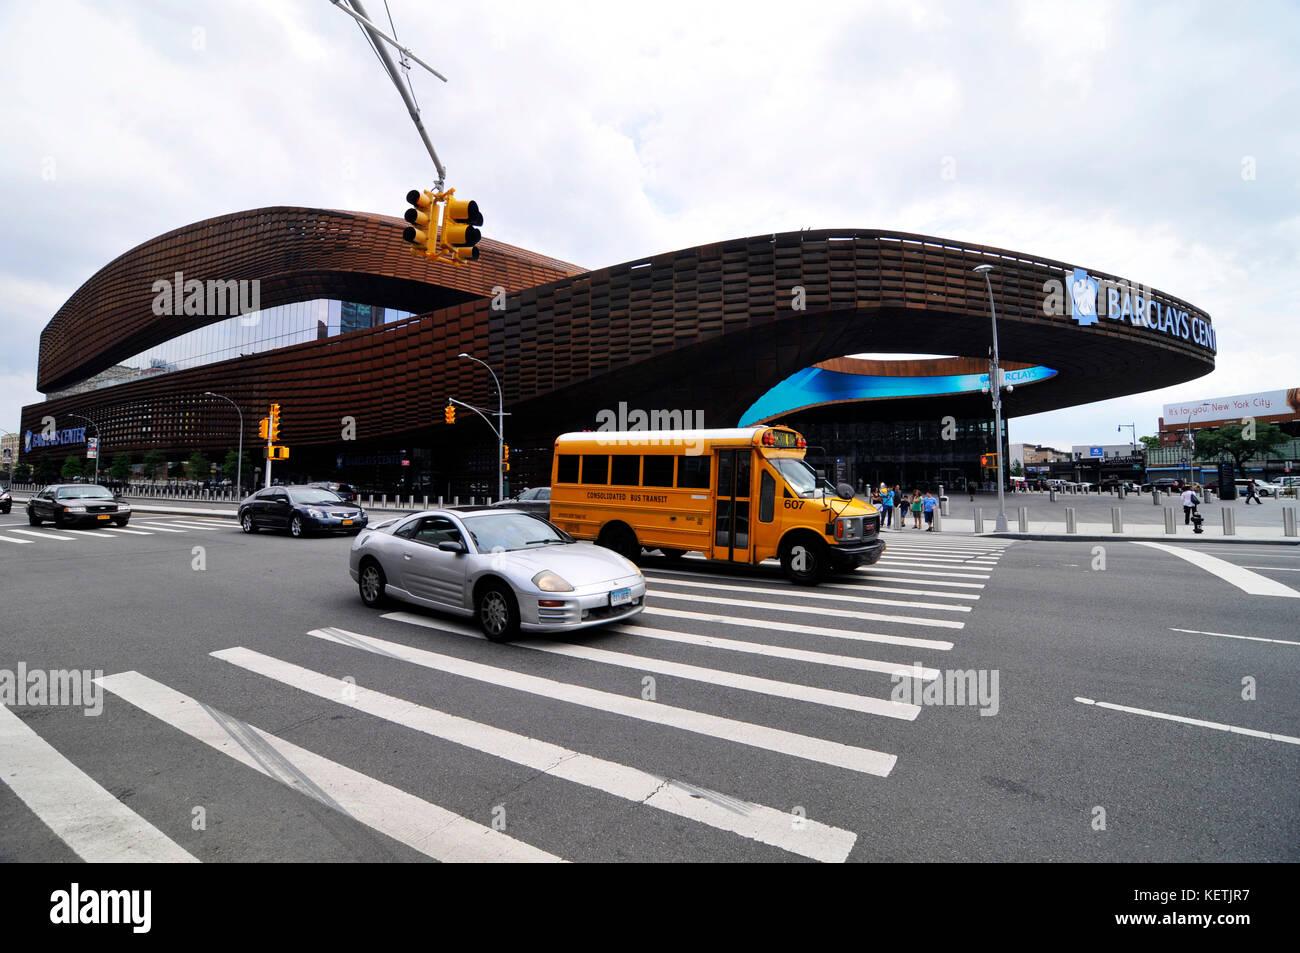 Barclays center new york stock photos barclays center for The barclay